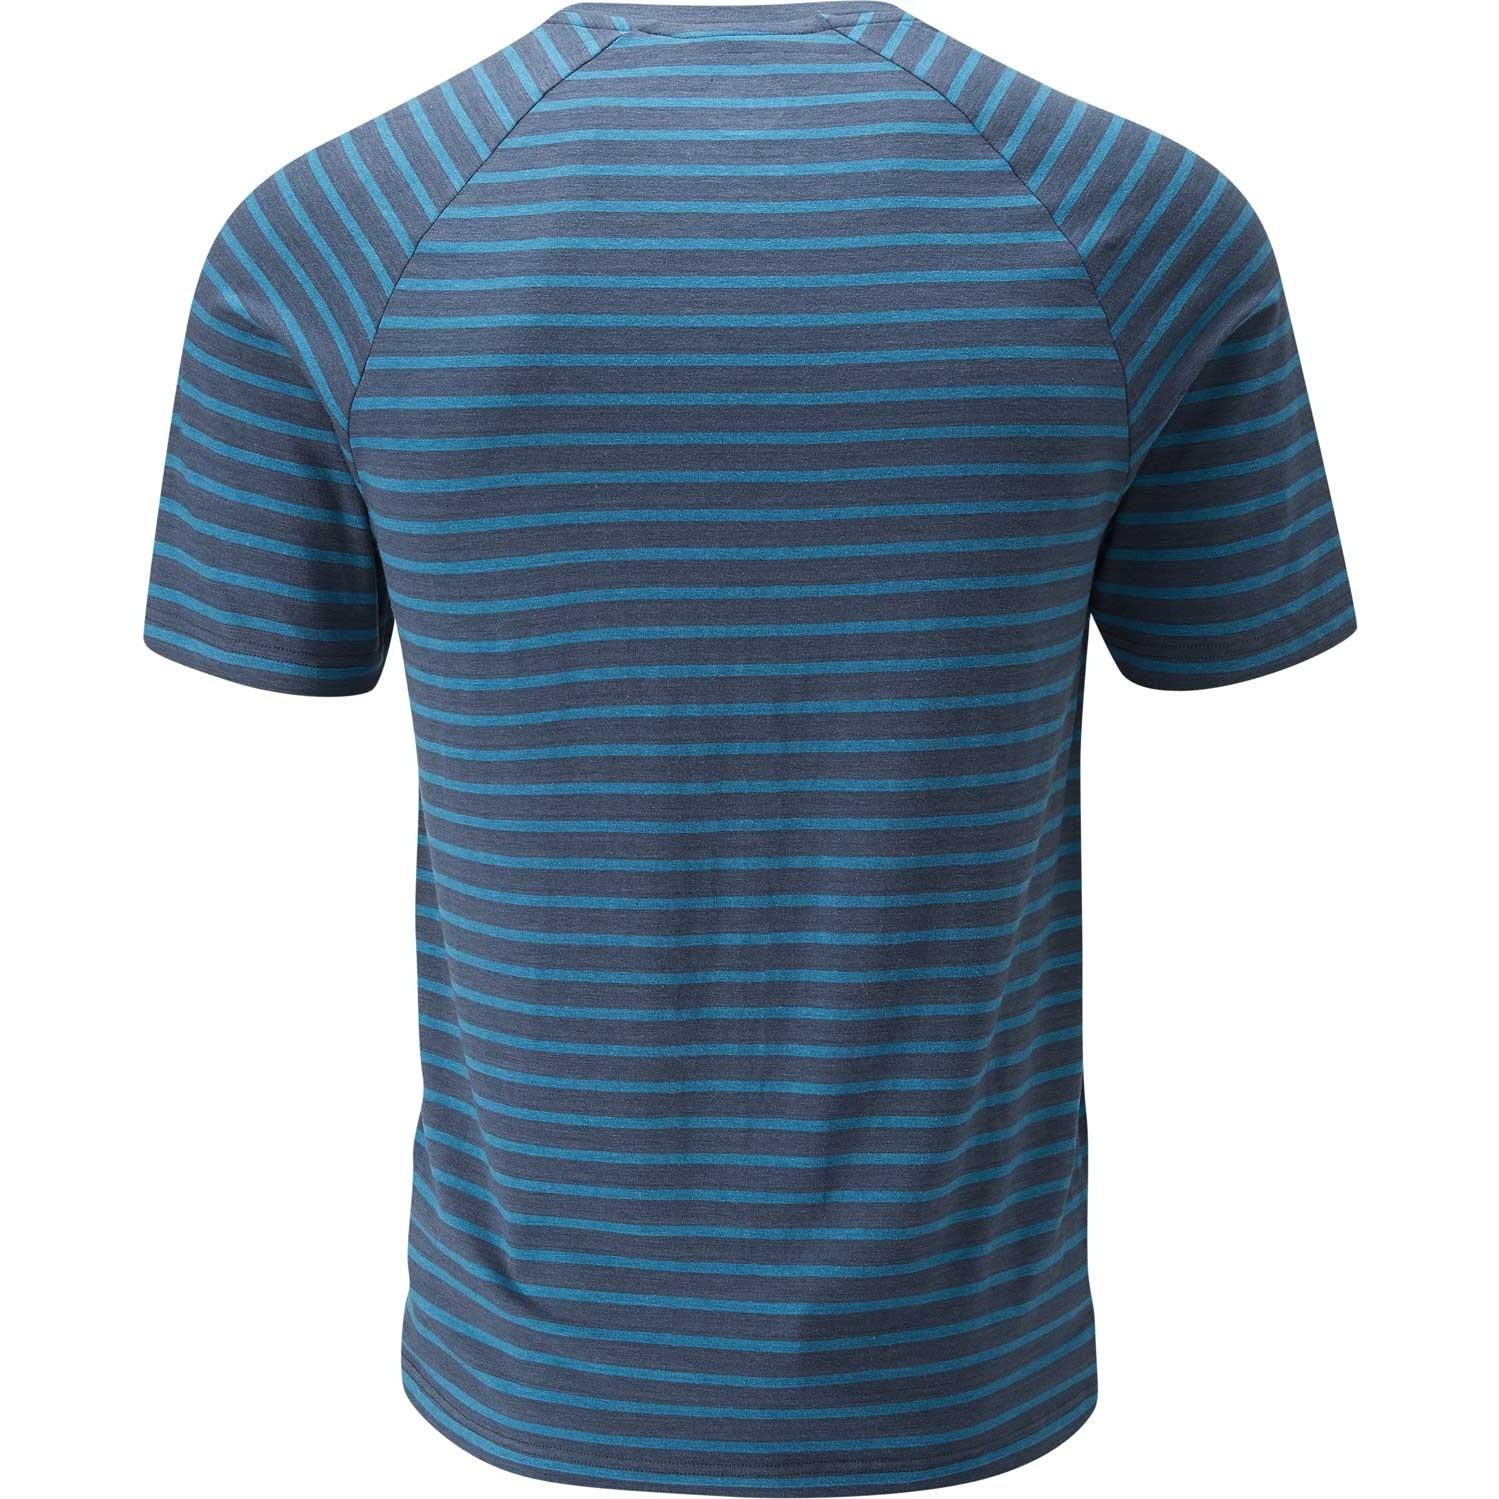 Moon Striped Bamboo Tech T-Shirt - Men's - Indigo/Midnight